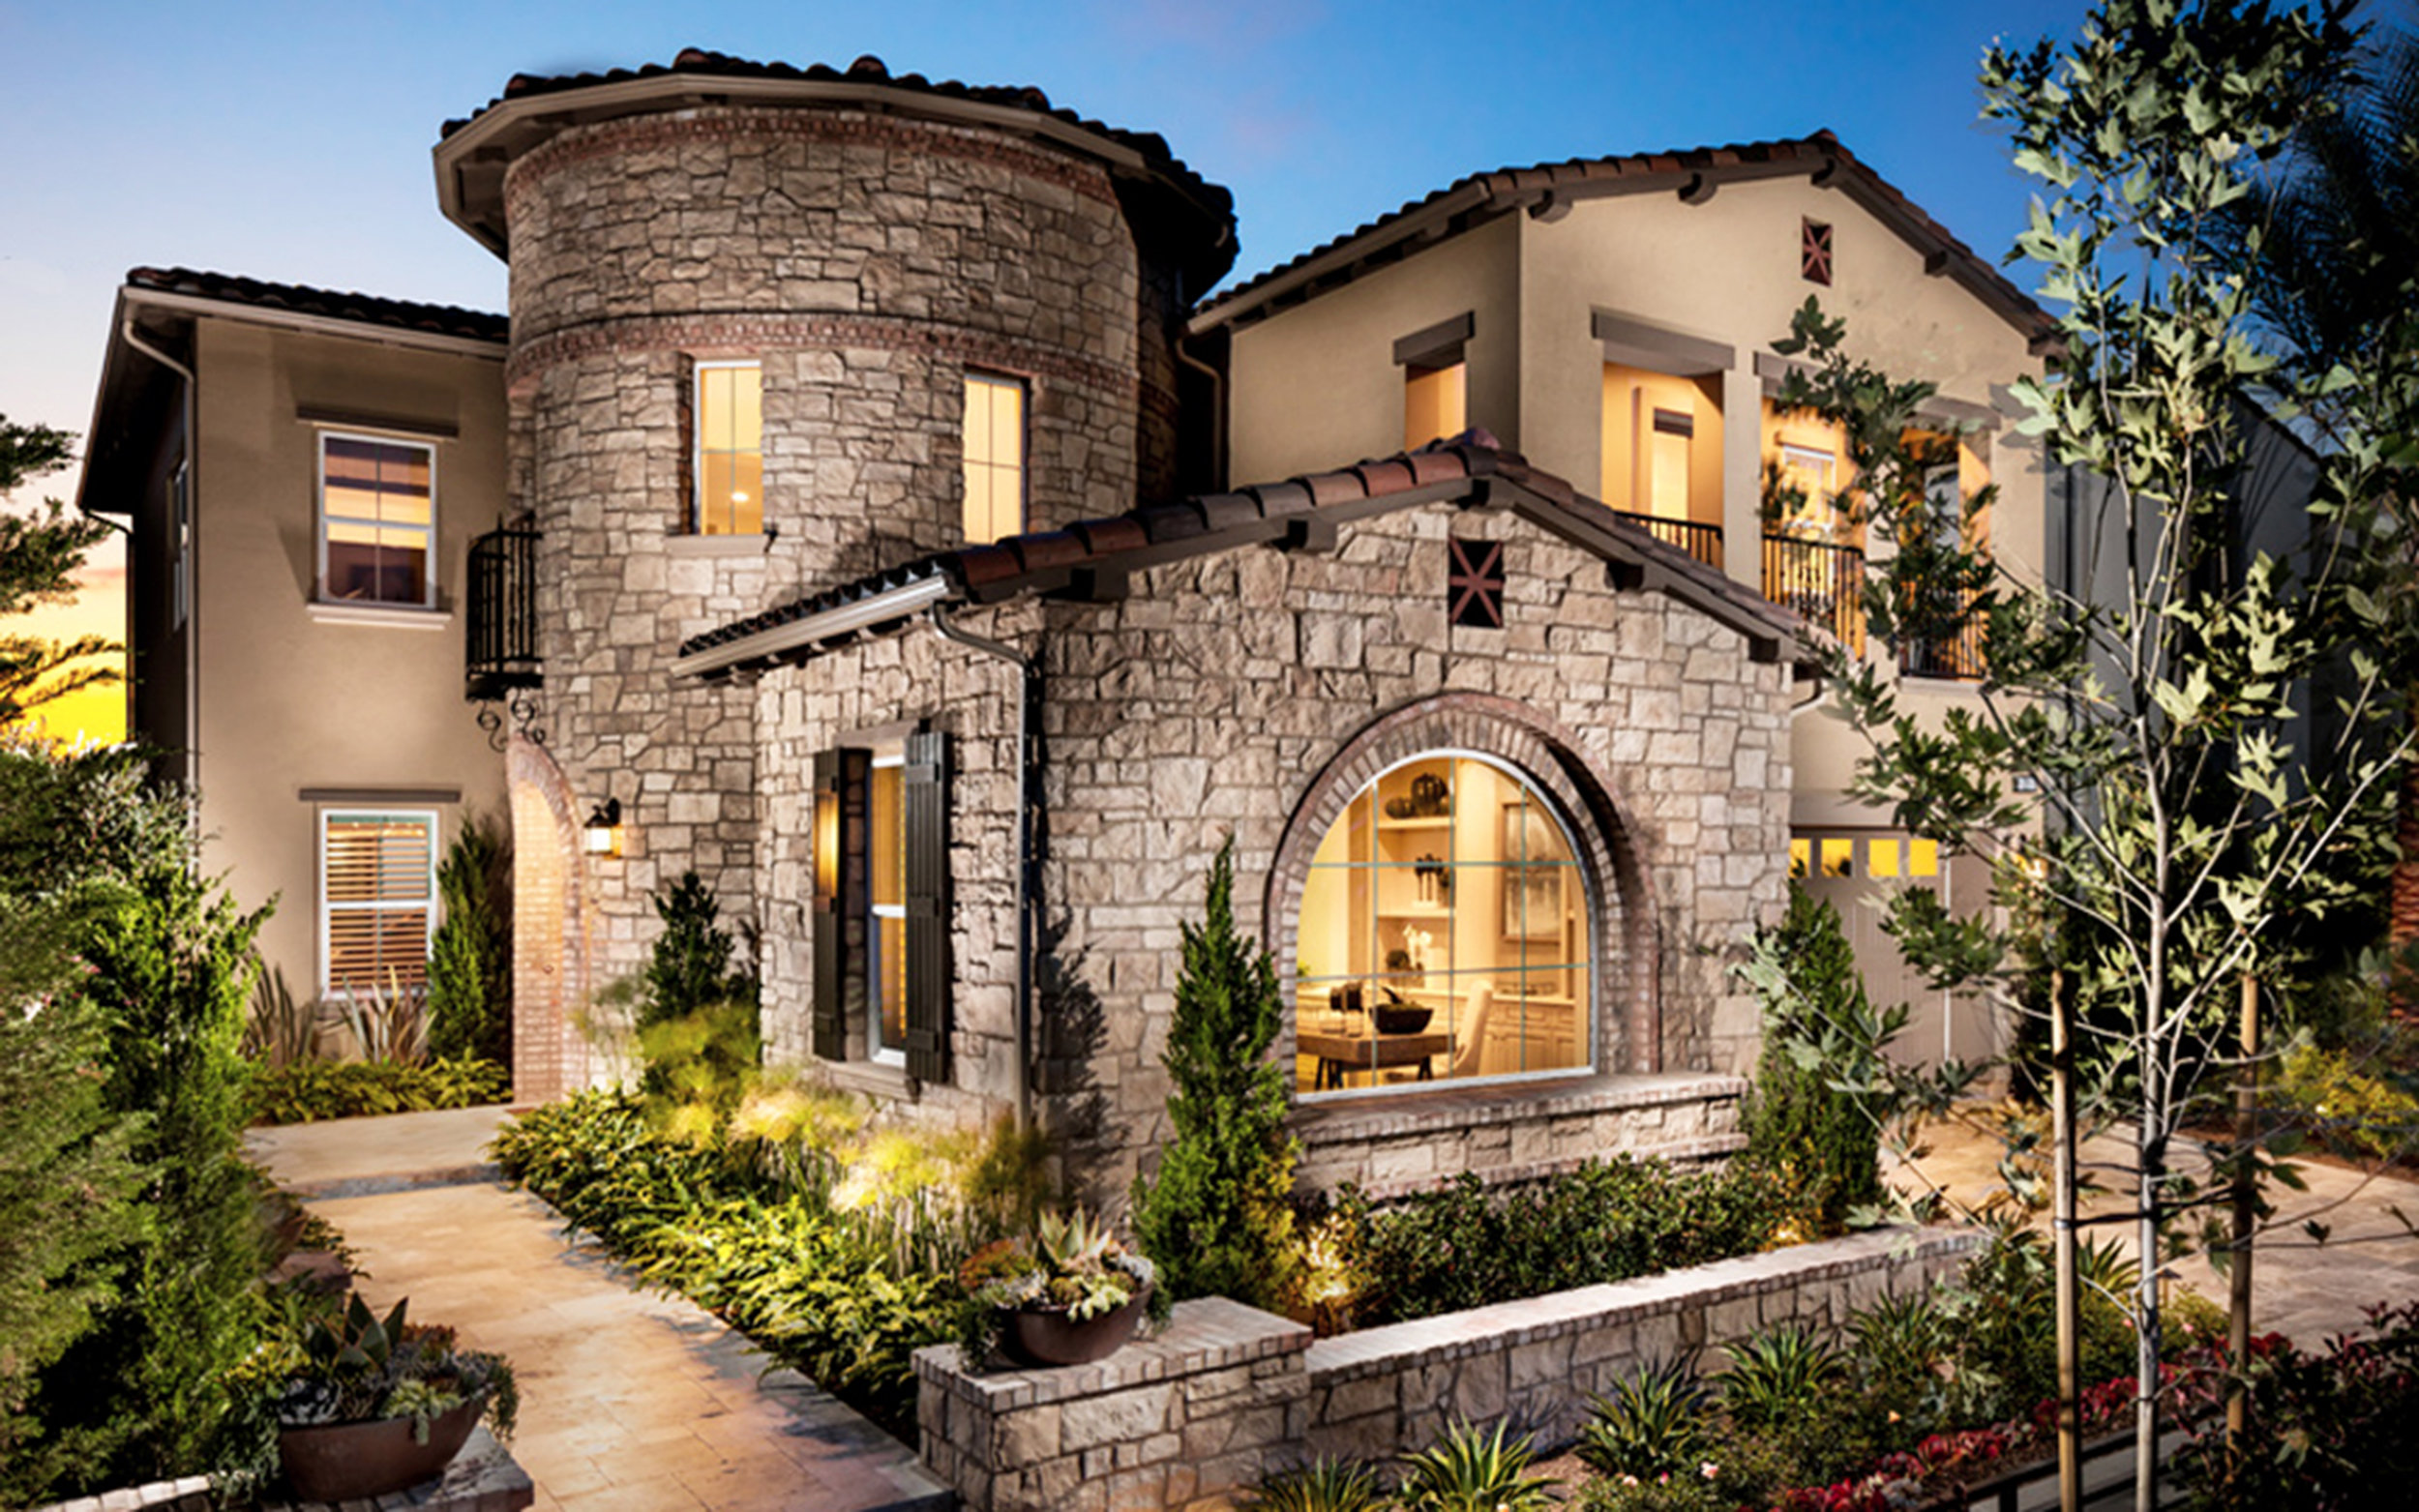 Coronado Stone - Coronado Stone has the largest variety of stone veneer profiles and colors.